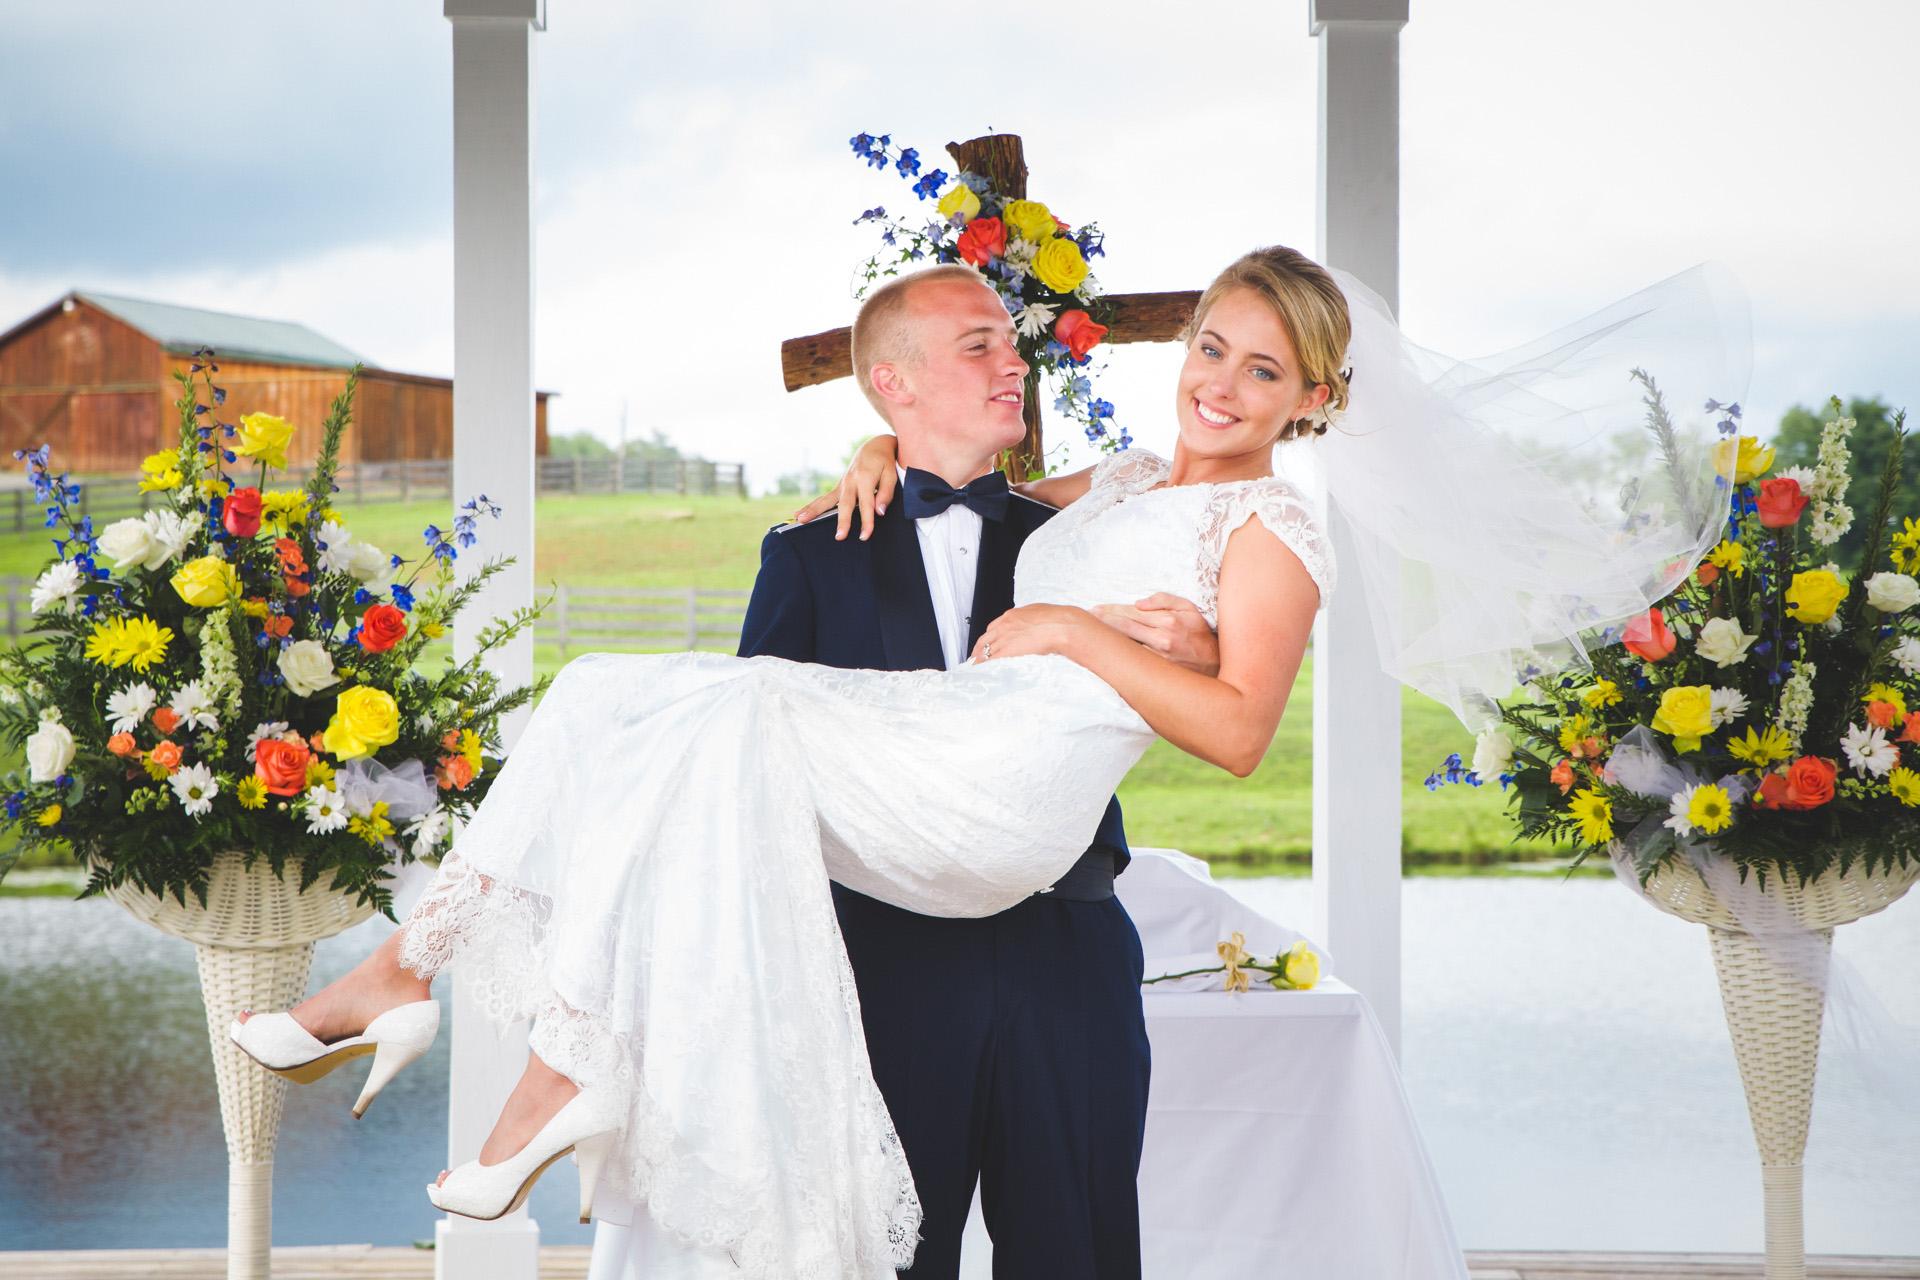 pittsburgh-wedding-photographer-at-lingrow-farm-man-nguyenphotography-slider